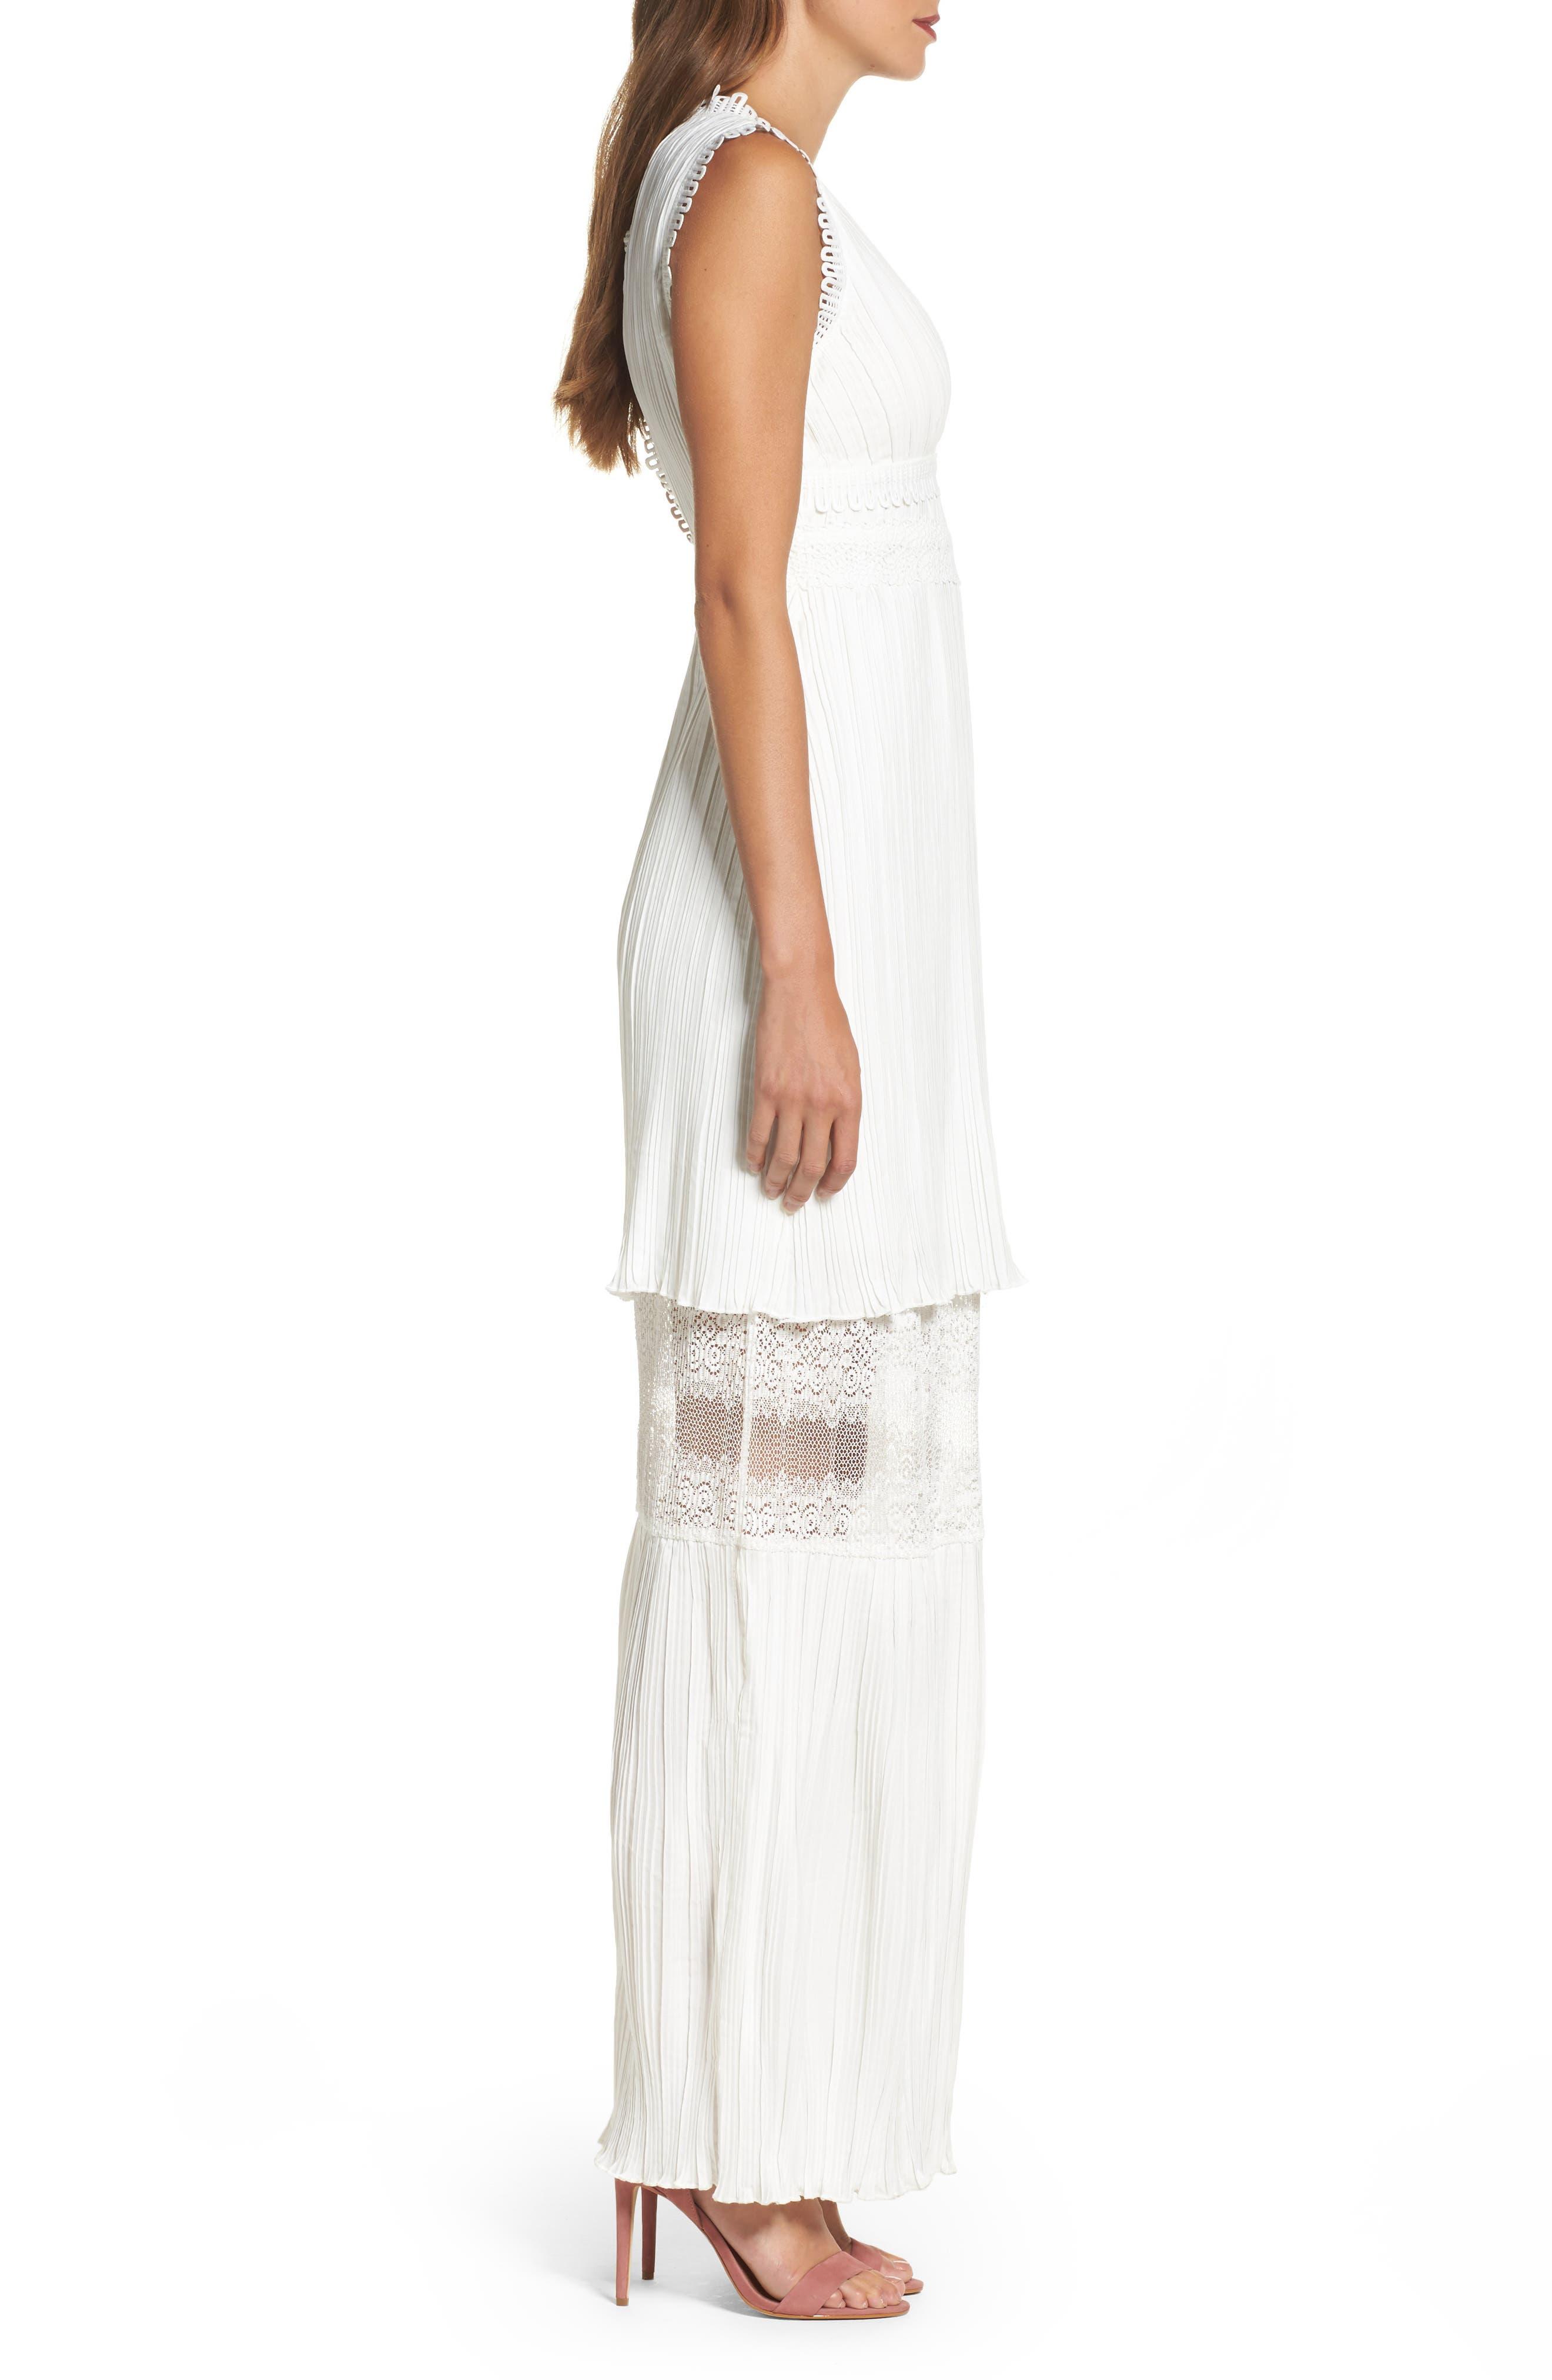 Jasmine Lace Inset Pleated Dress,                             Alternate thumbnail 3, color,                             Ivory